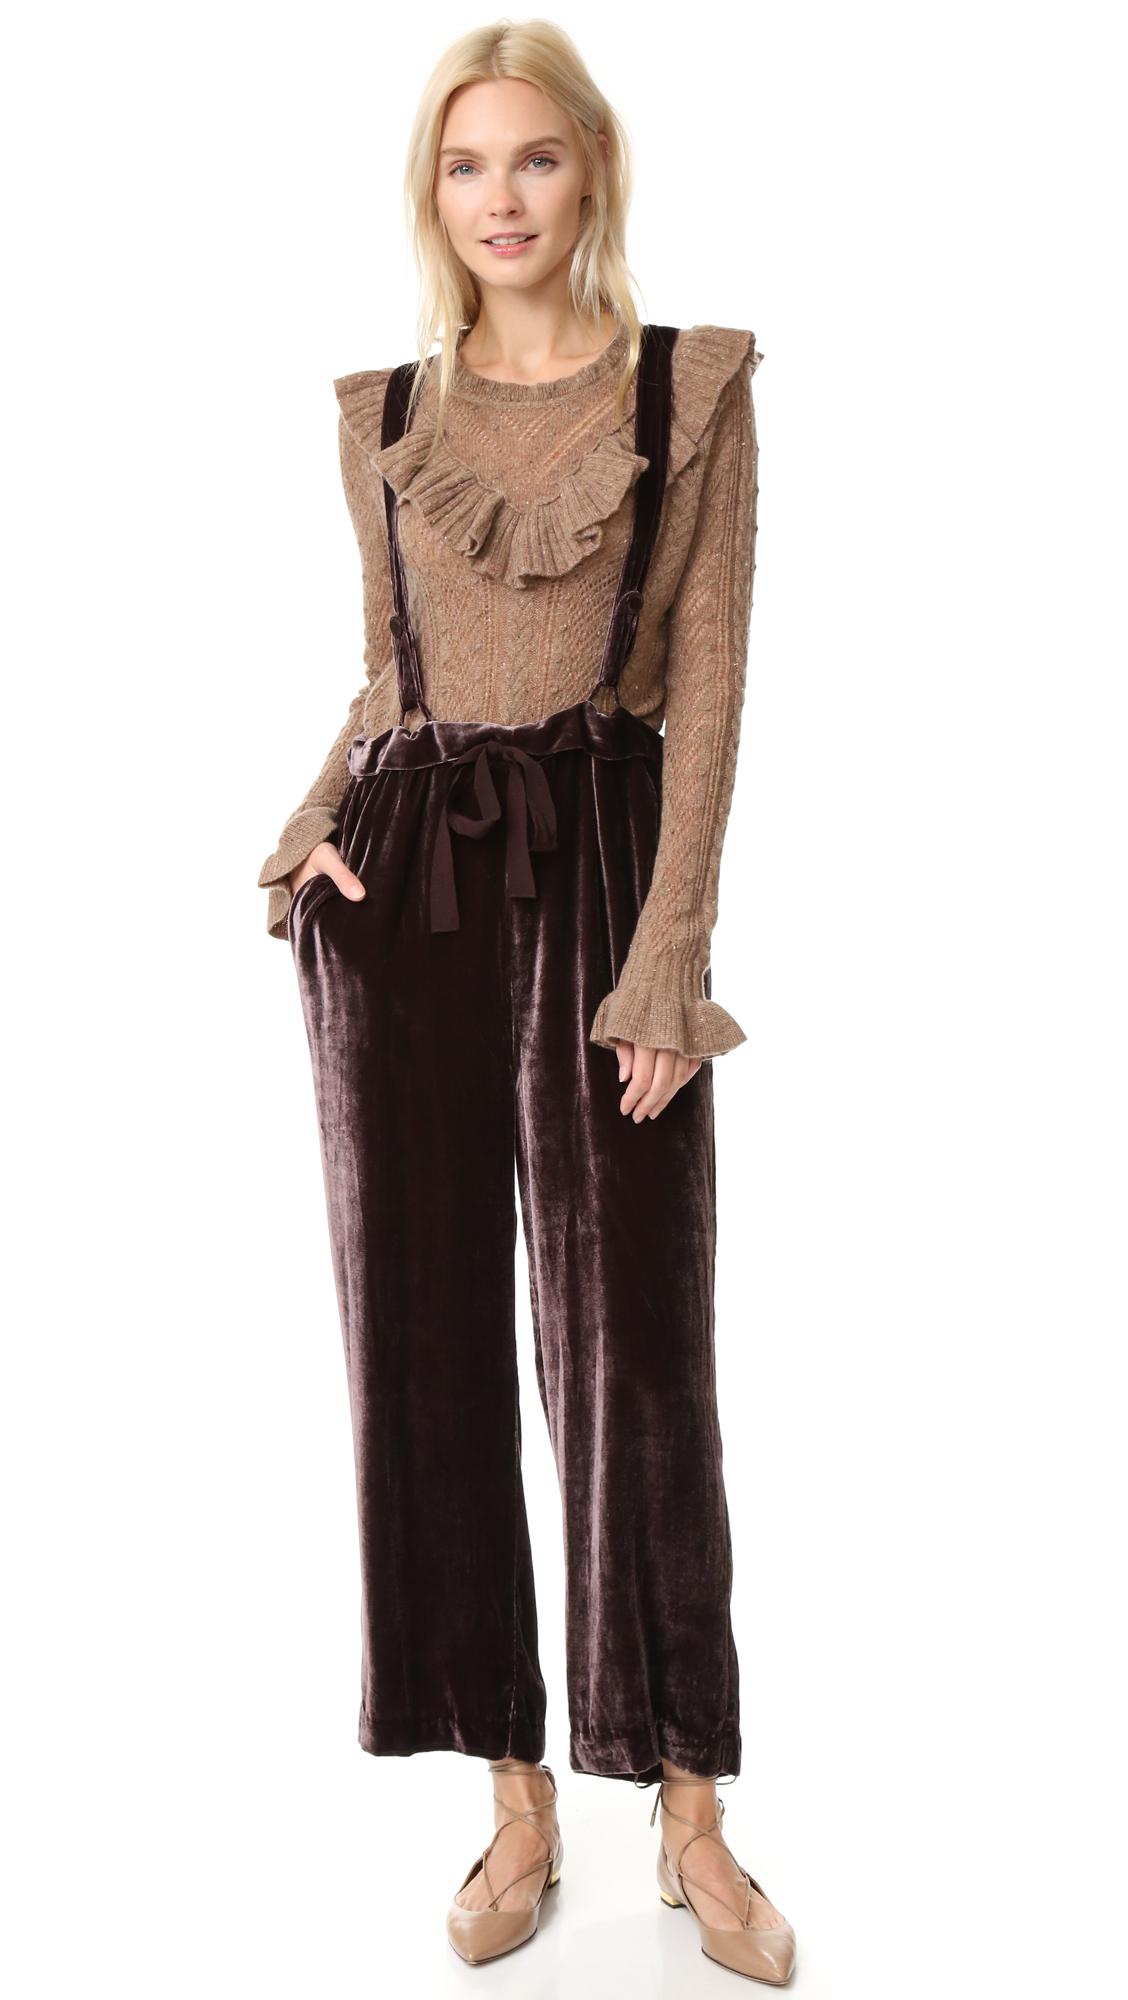 Slouchy Ulla Johnson overalls in soft velvet. Slant hip pockets. Adjustable crossover shoulder straps. Fabric: Velvet. 82% viscose/18% silk. Dry clean. Imported, India. Measurements Inseam: 24.5in / 62cm Leg opening: 20.5in / 52cm Measurements from size 4. Available sizes: 4